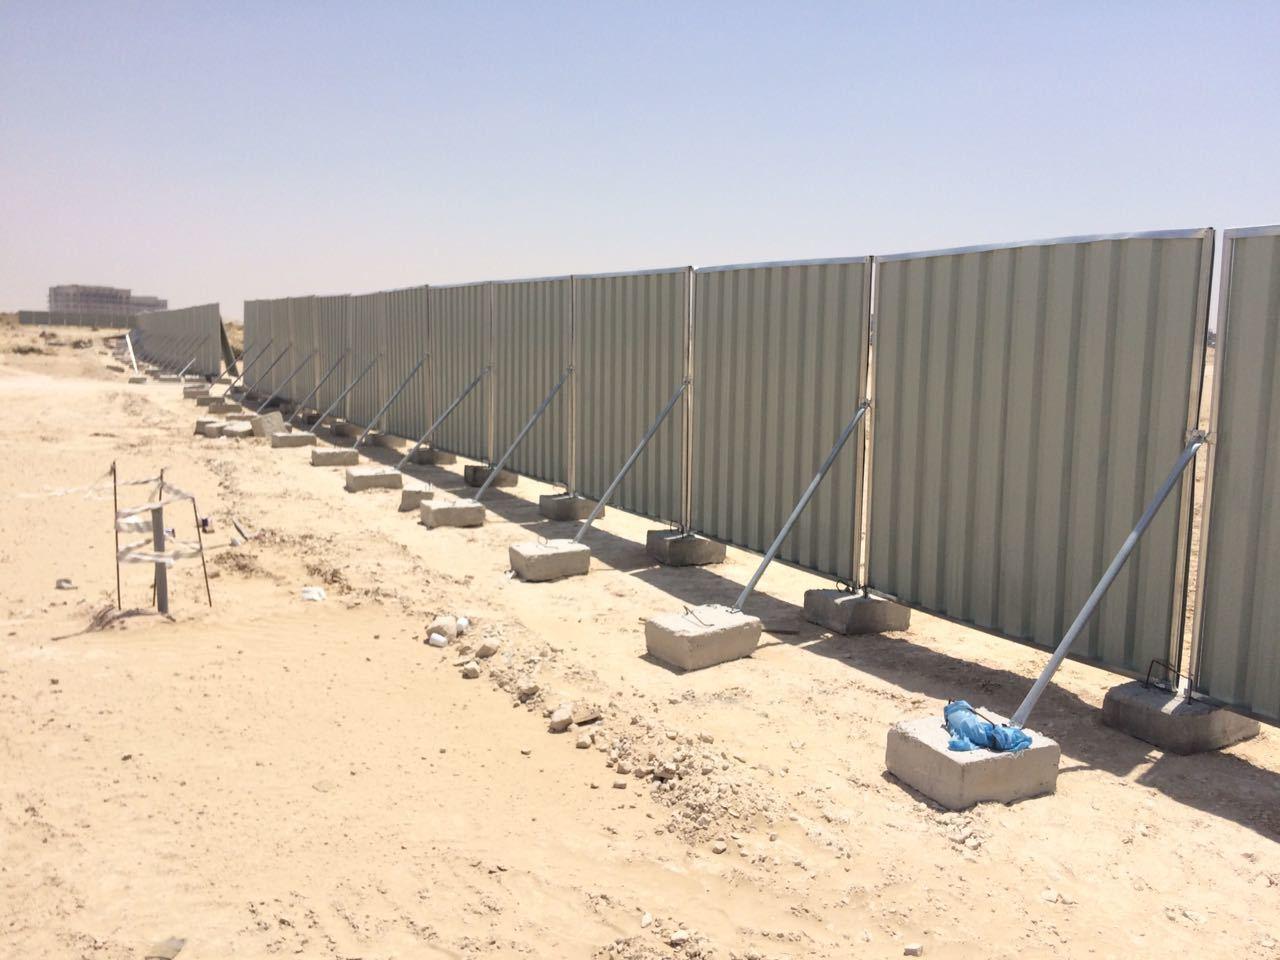 Fence Hoarding Panel Supplier in UAE Manufacturer,Fence Hoarding